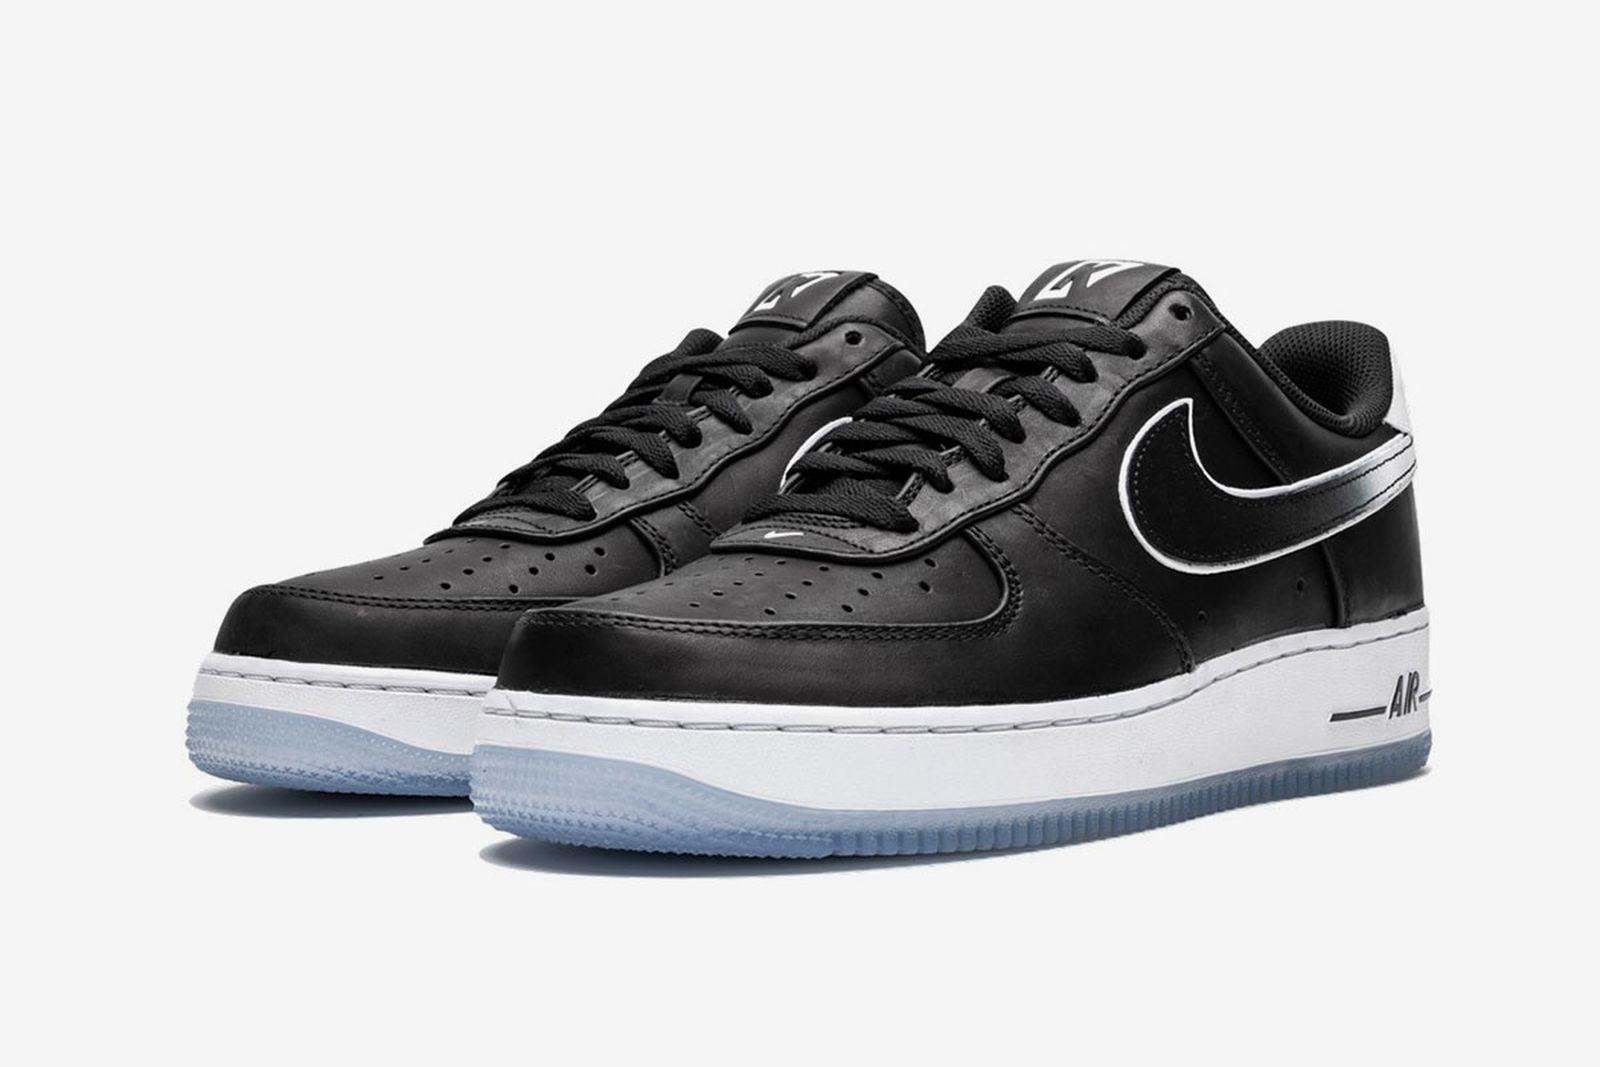 Nike x Colin Kaepernick Air Force 1